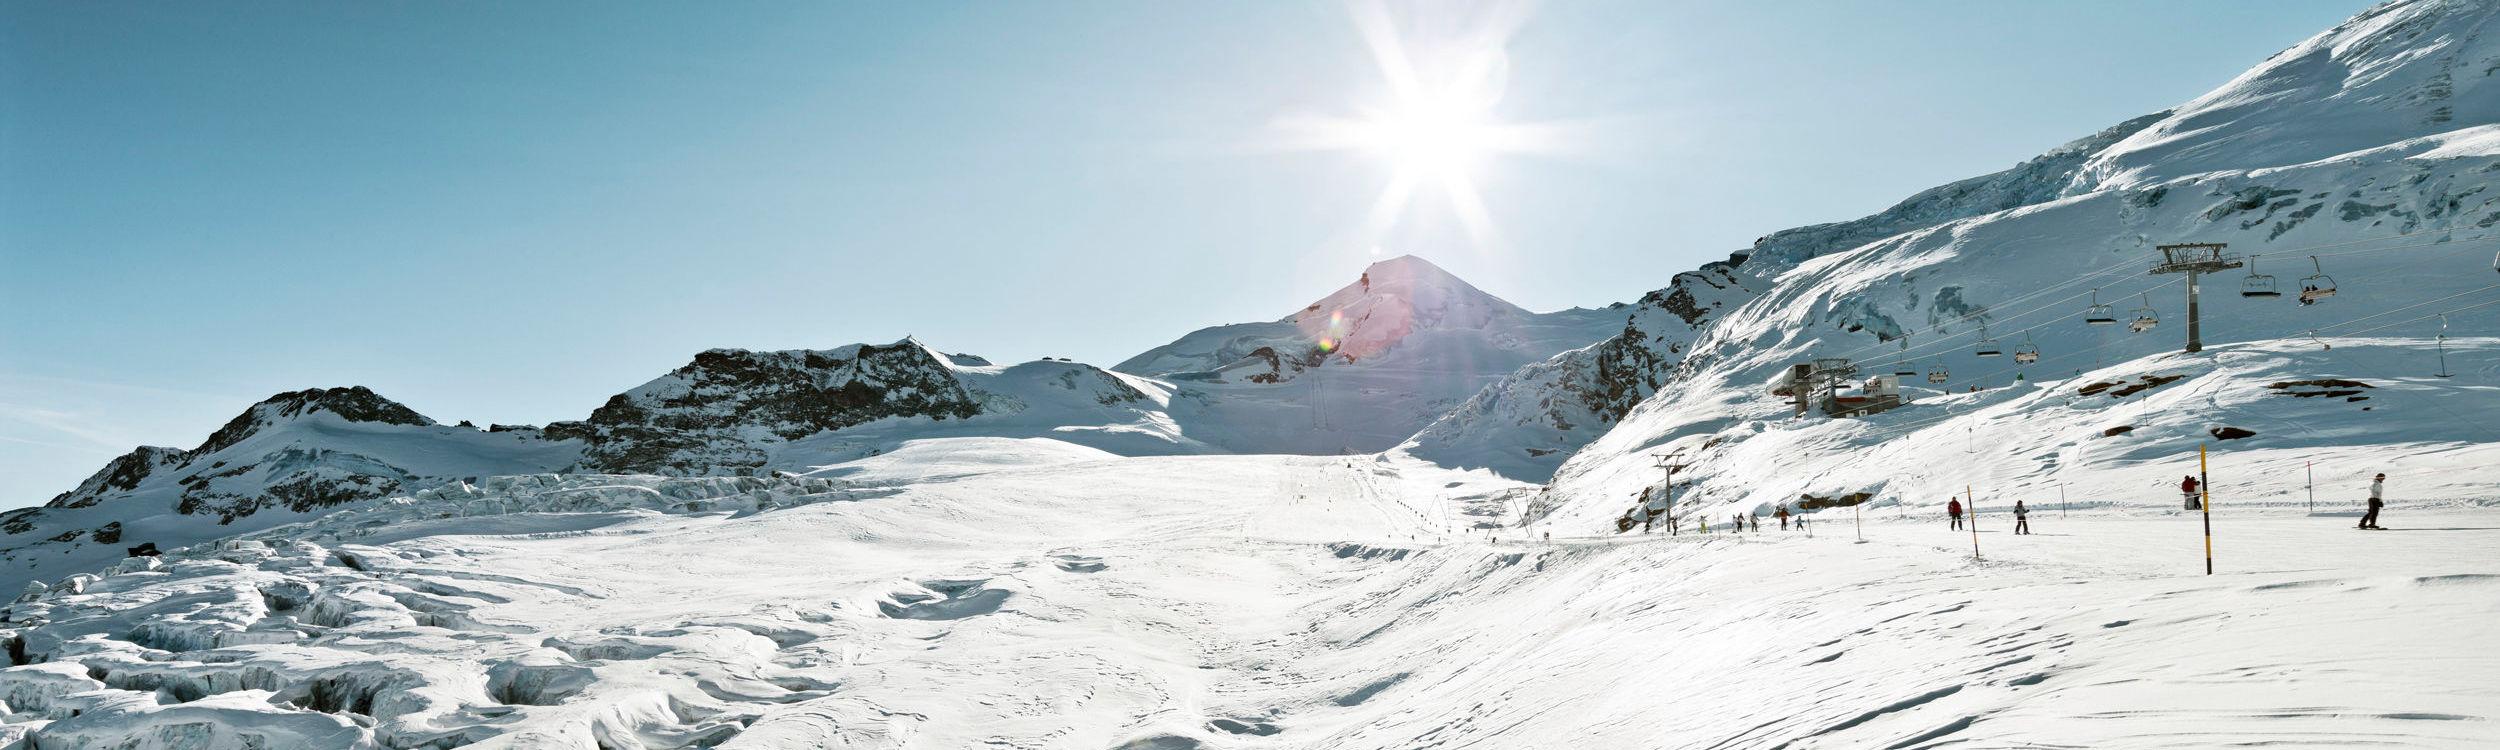 Saas-Fee Winterpanorama